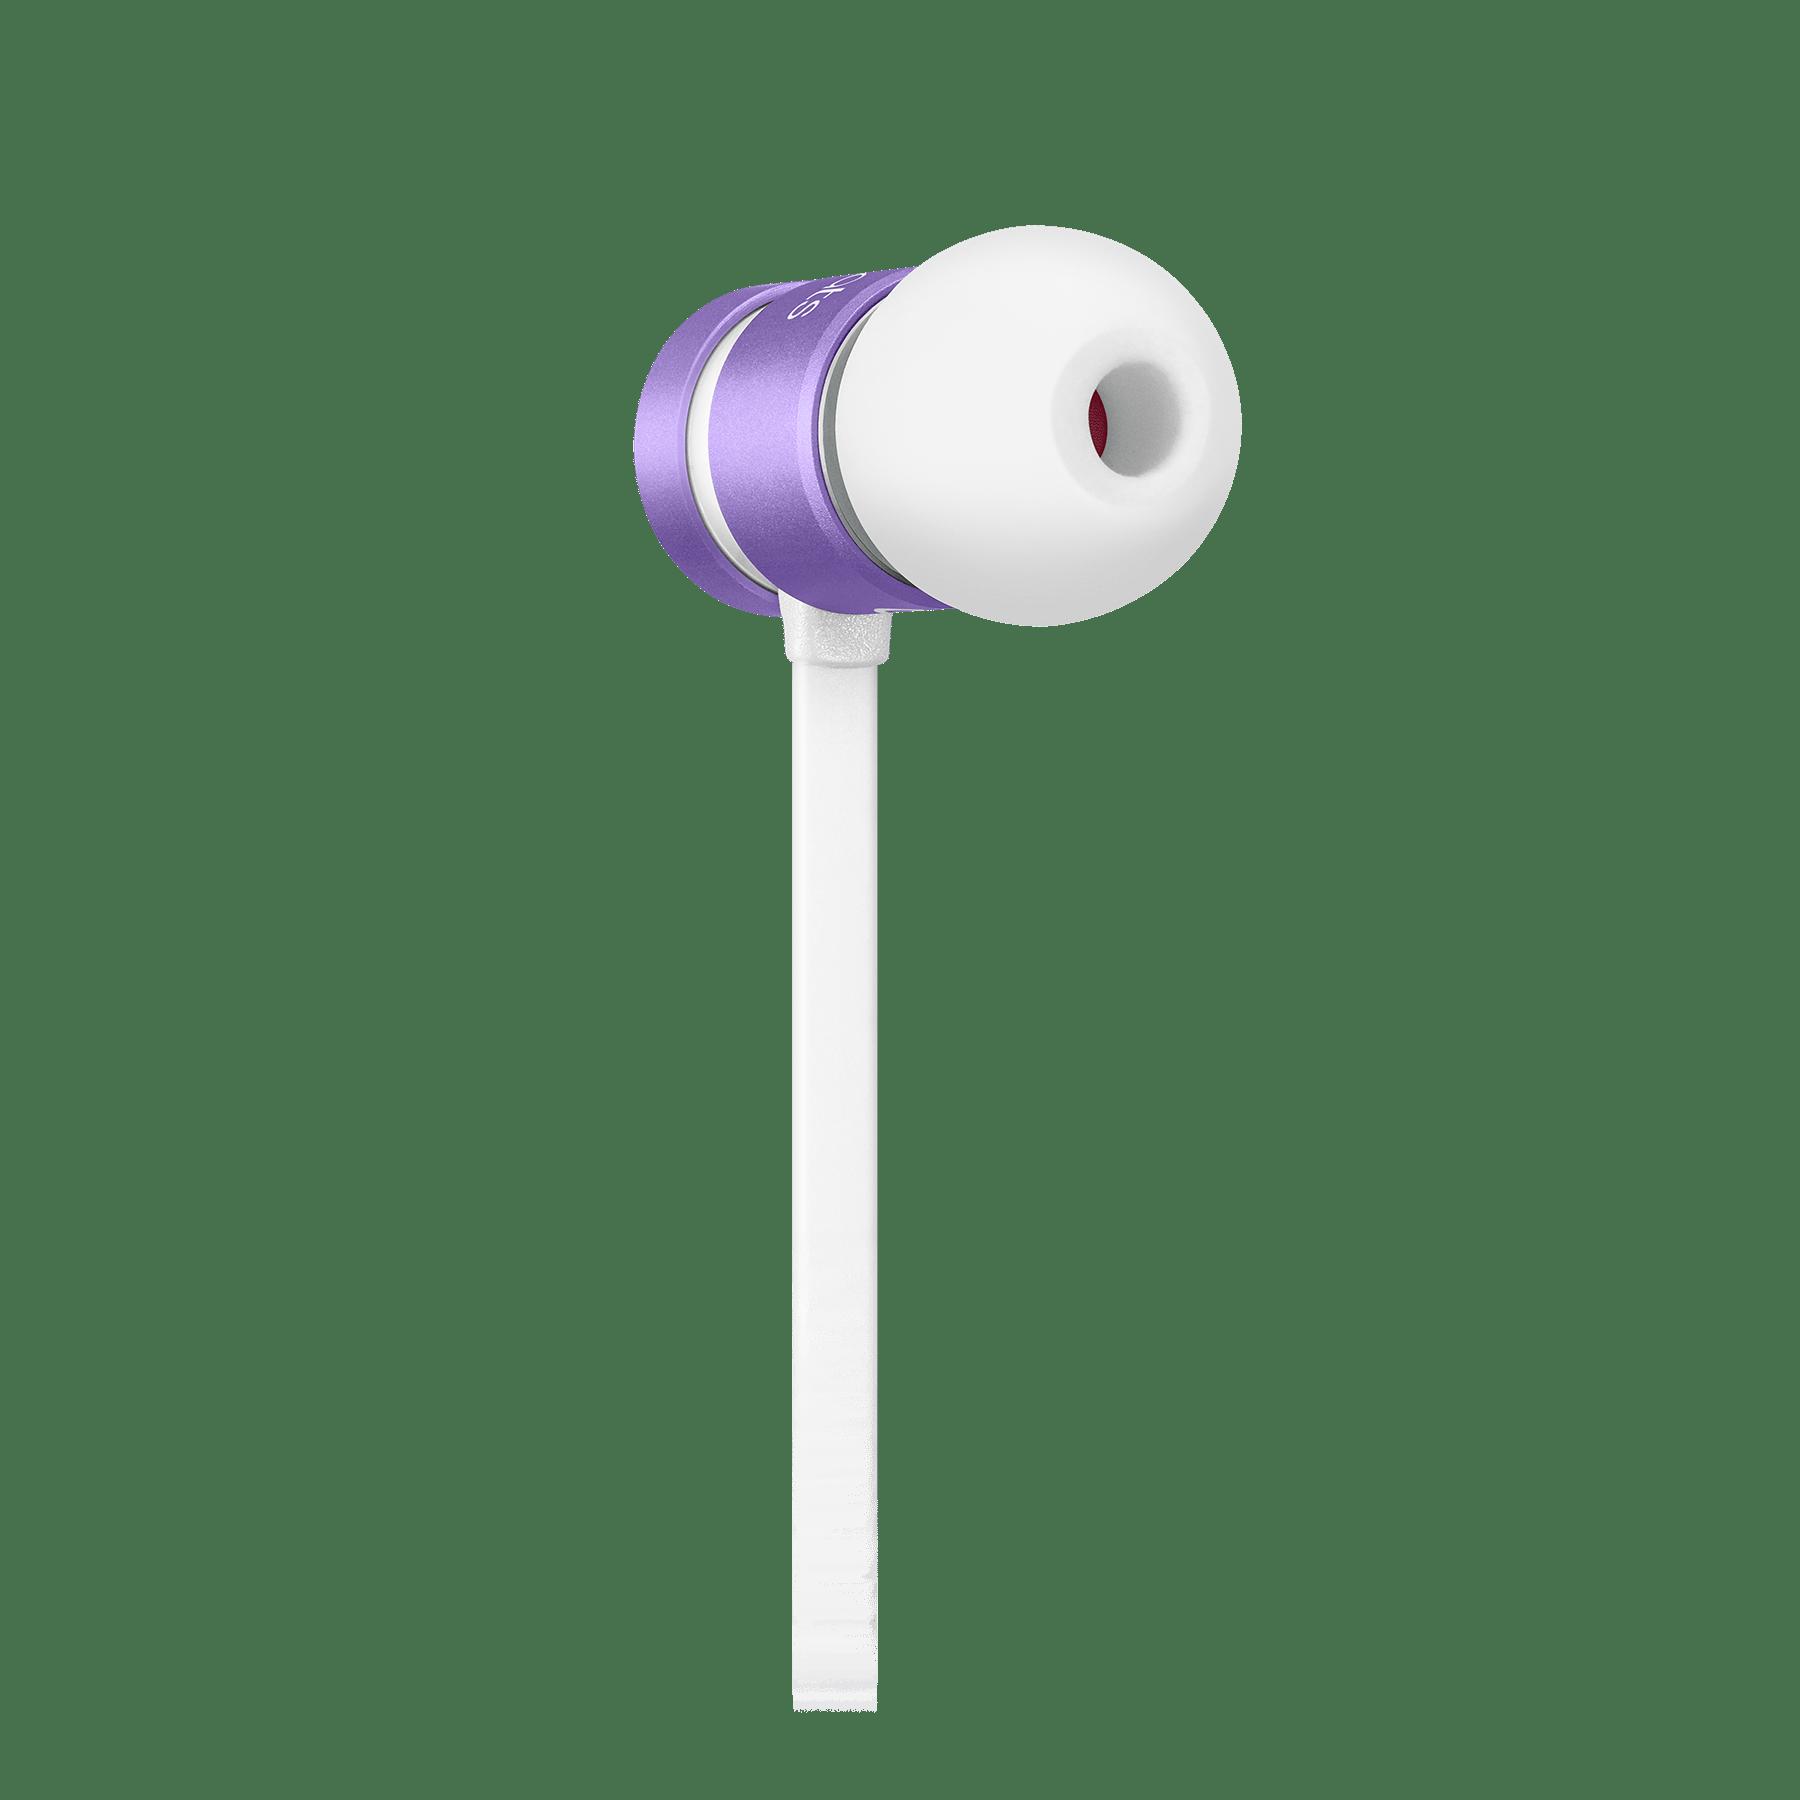 Earphones wireless rose - wireless earphones with storage